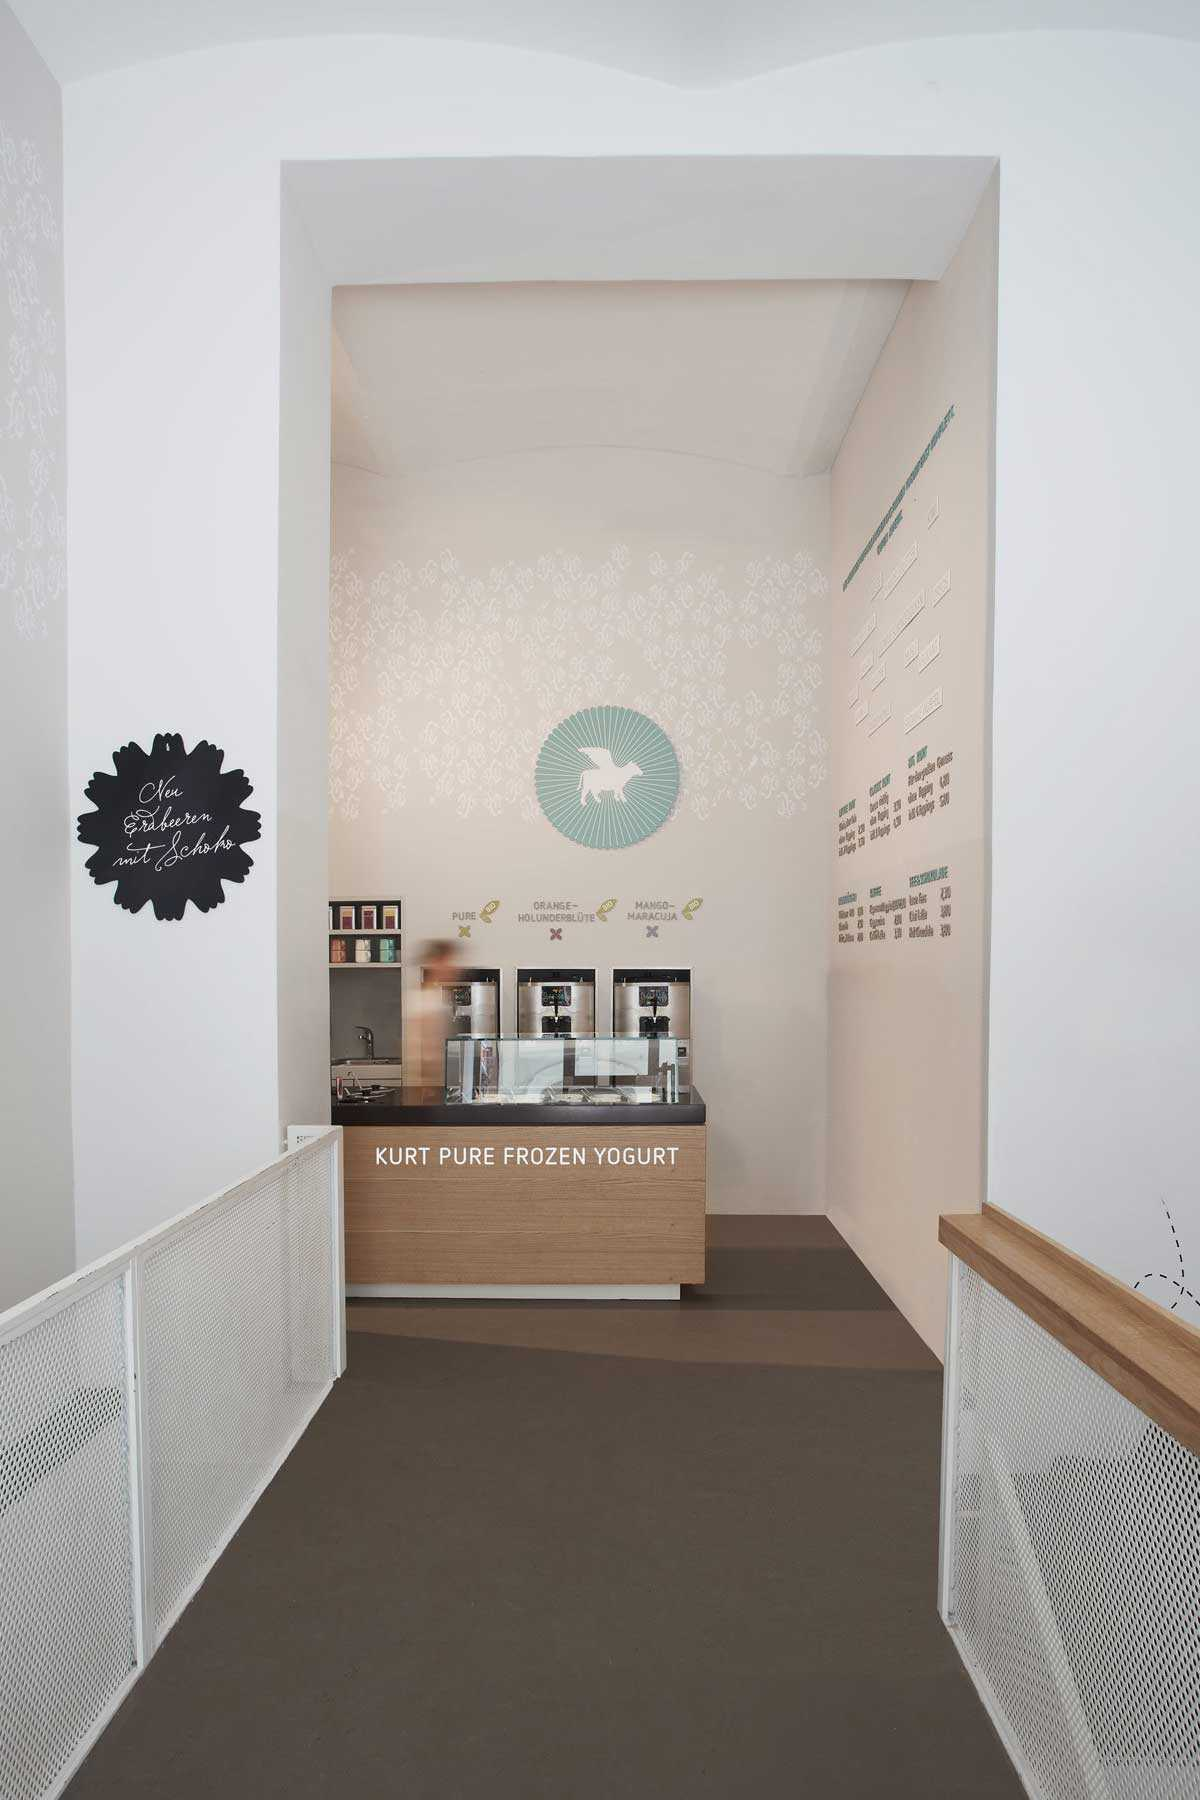 062 Kurt Foto Shop